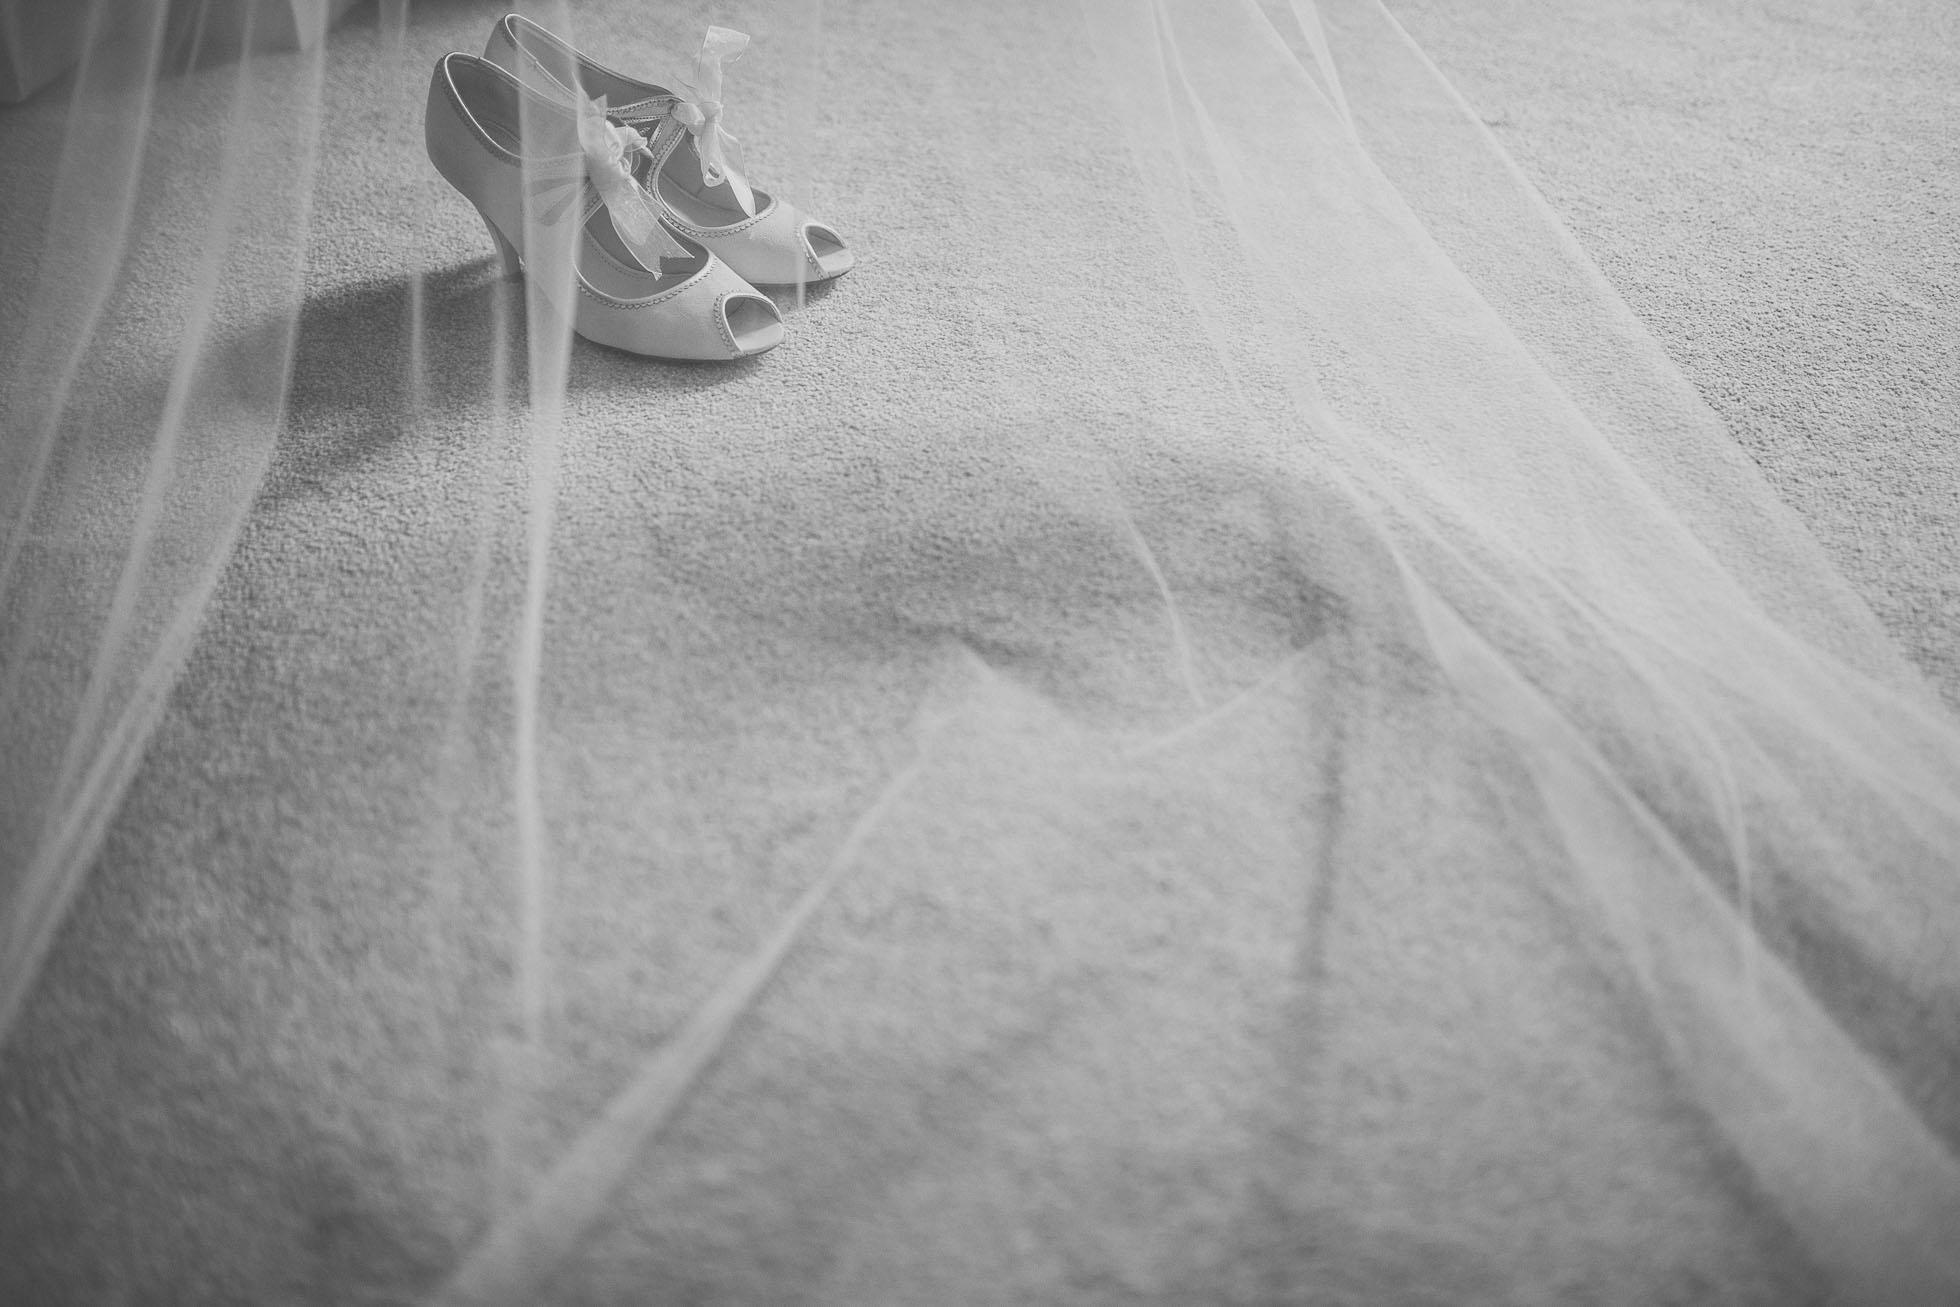 denton-hall-wedding-photographer-2.jpg